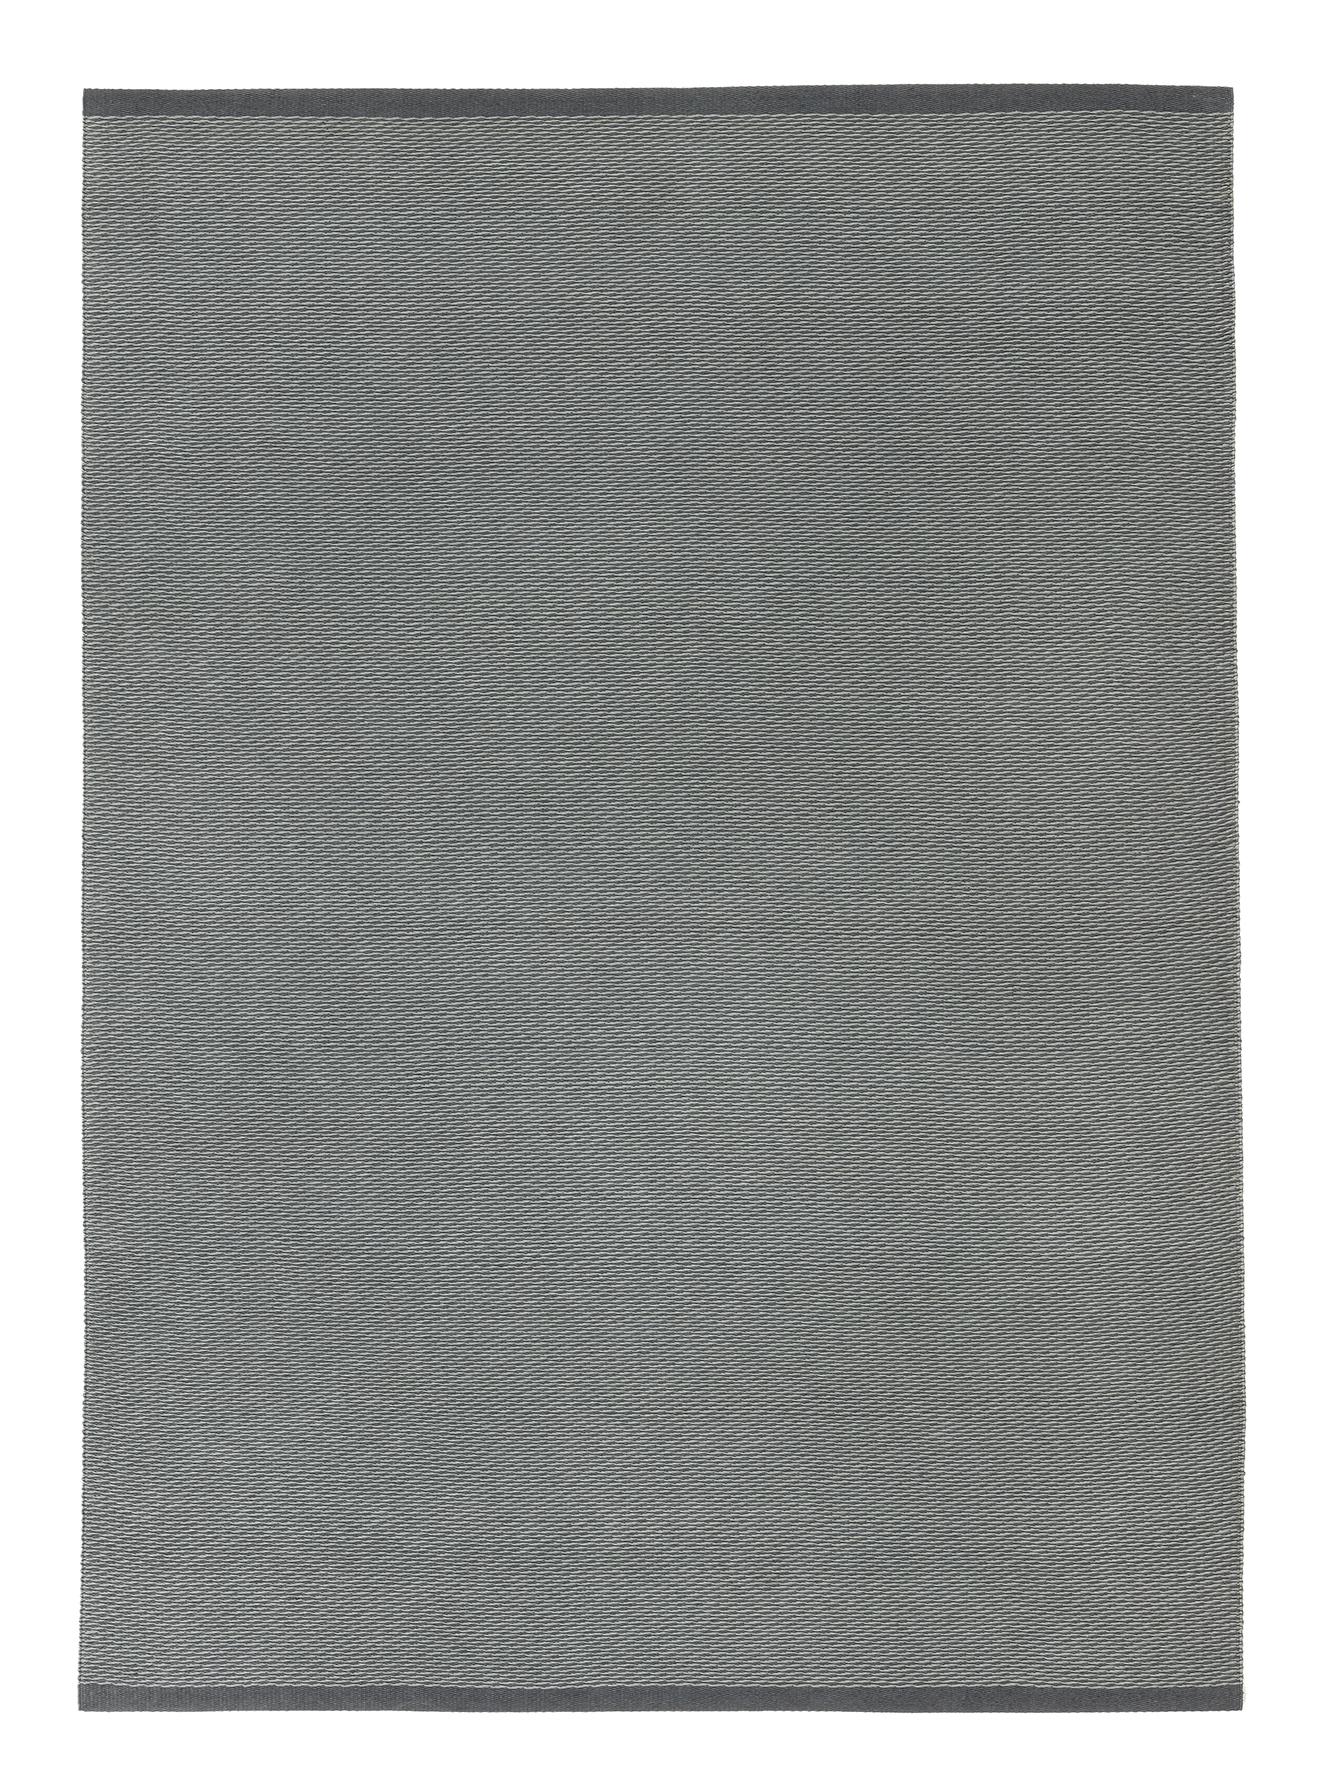 Betula 1416 Charcoal/Grey